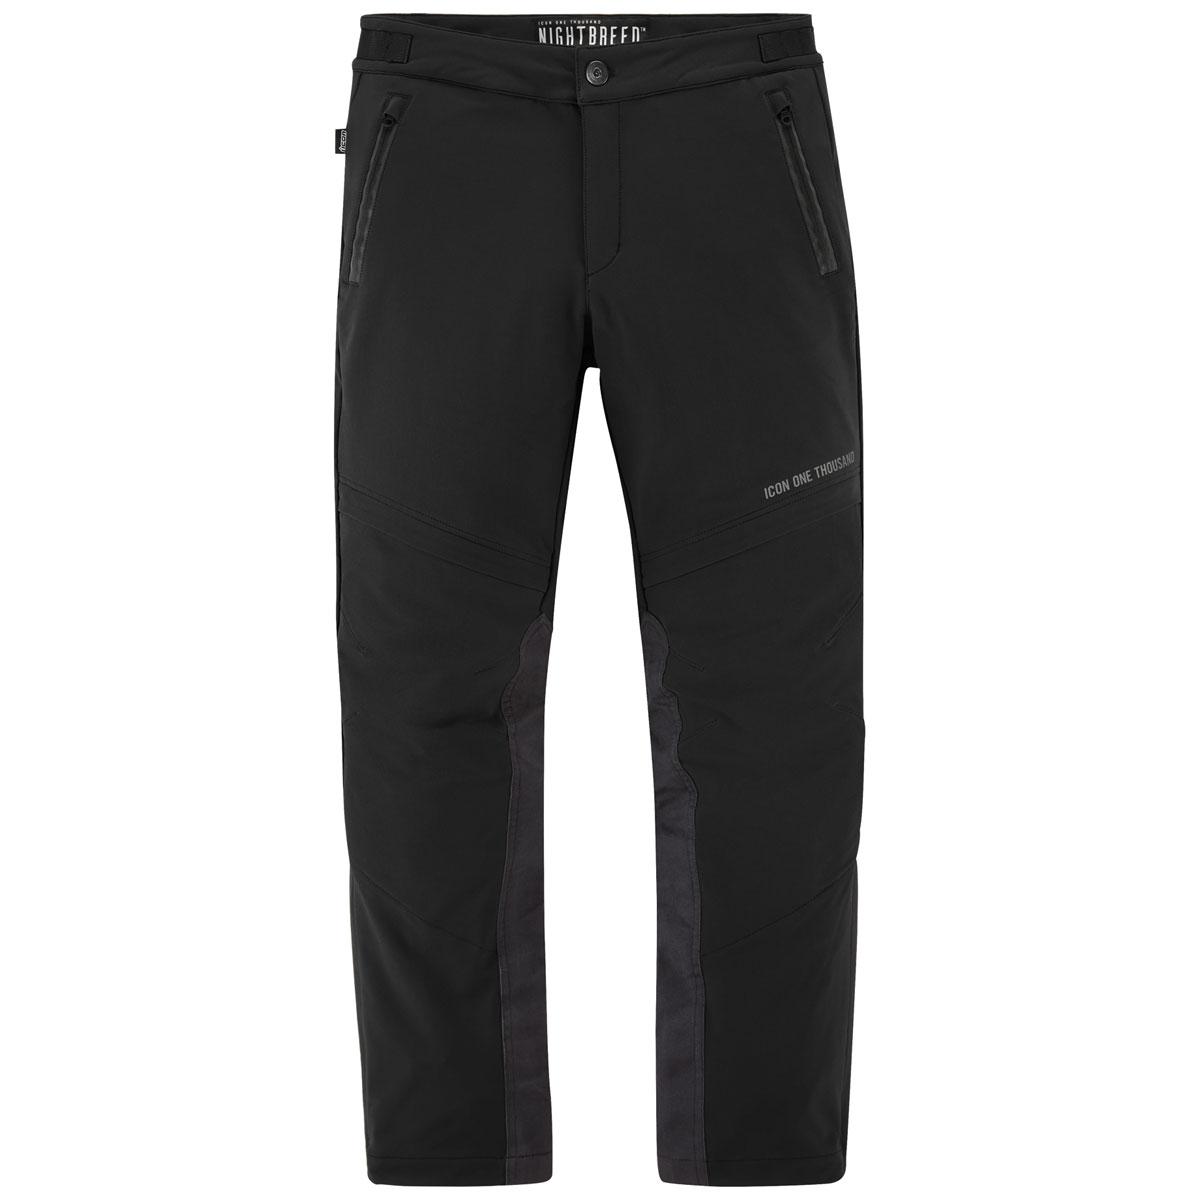 ICON One Thousand Men's Nightbreed Black Pants